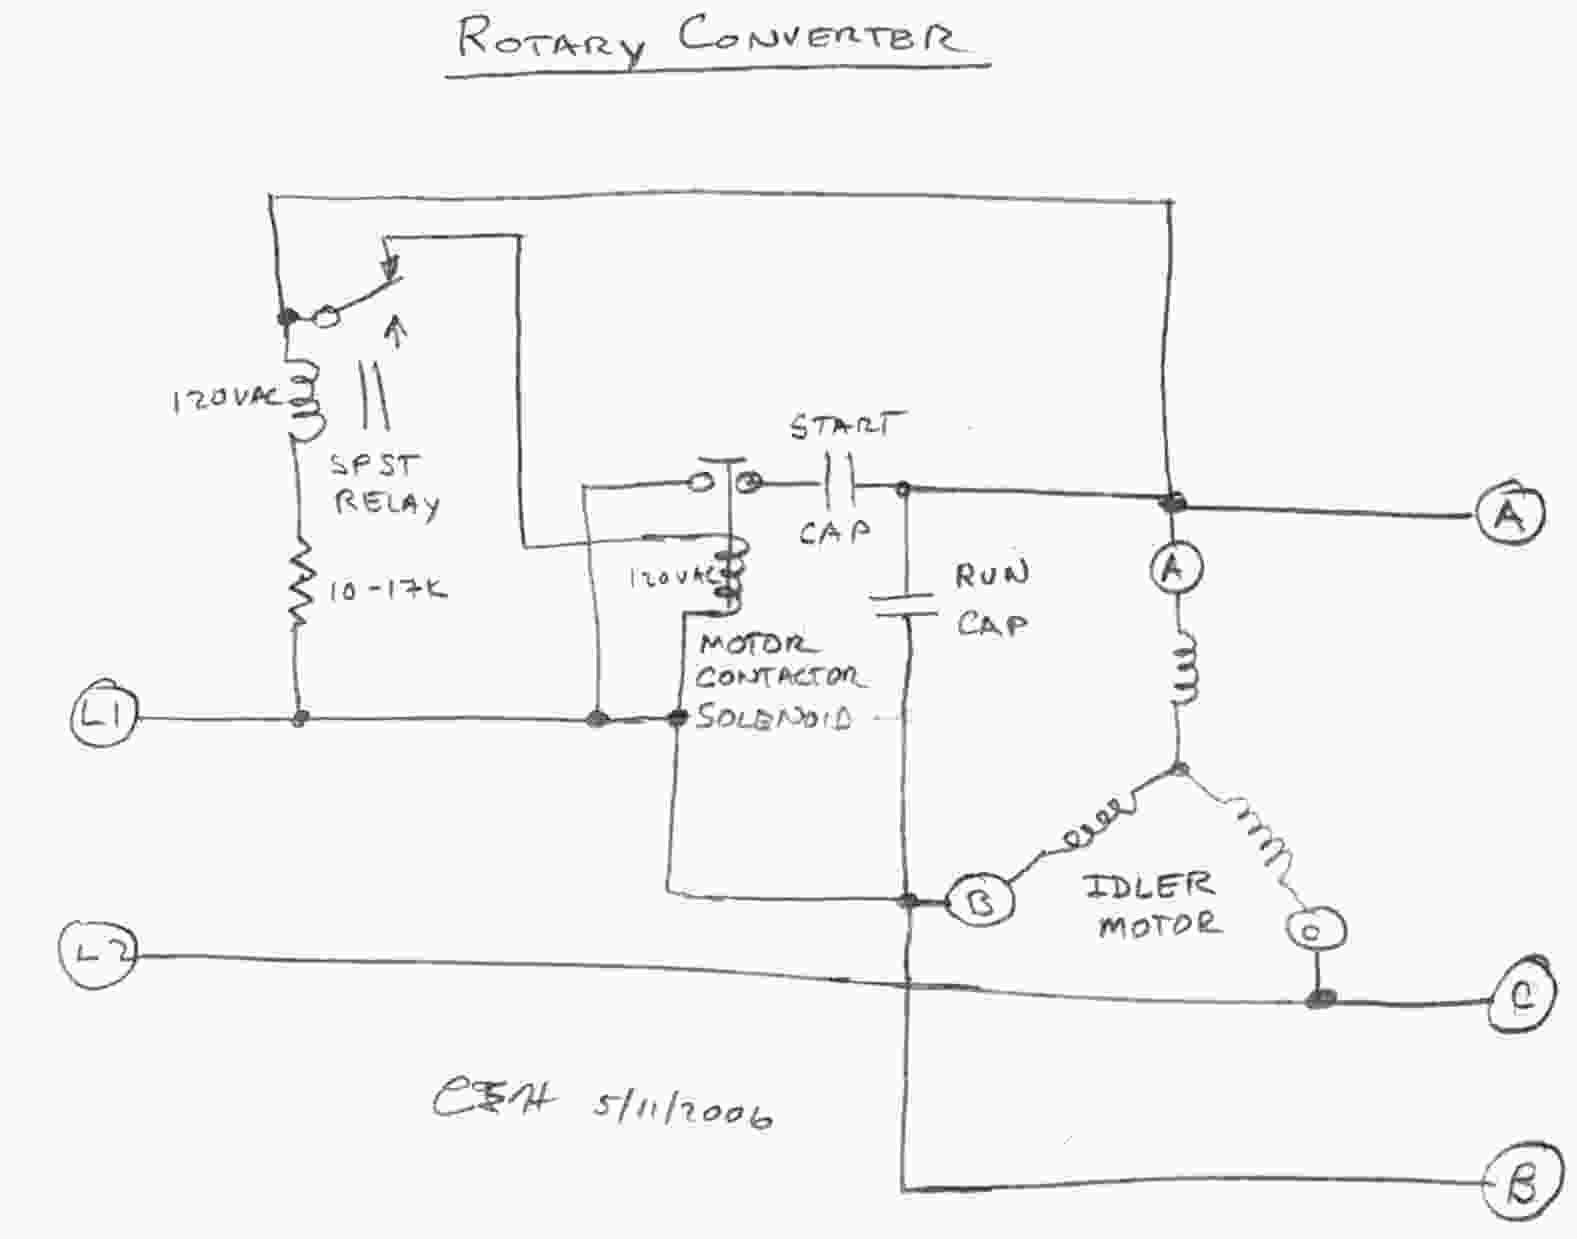 hight resolution of nest 3 wiring diagram nest wireless thermostat wiring diagram new nest thermostat wiring diagram wellread